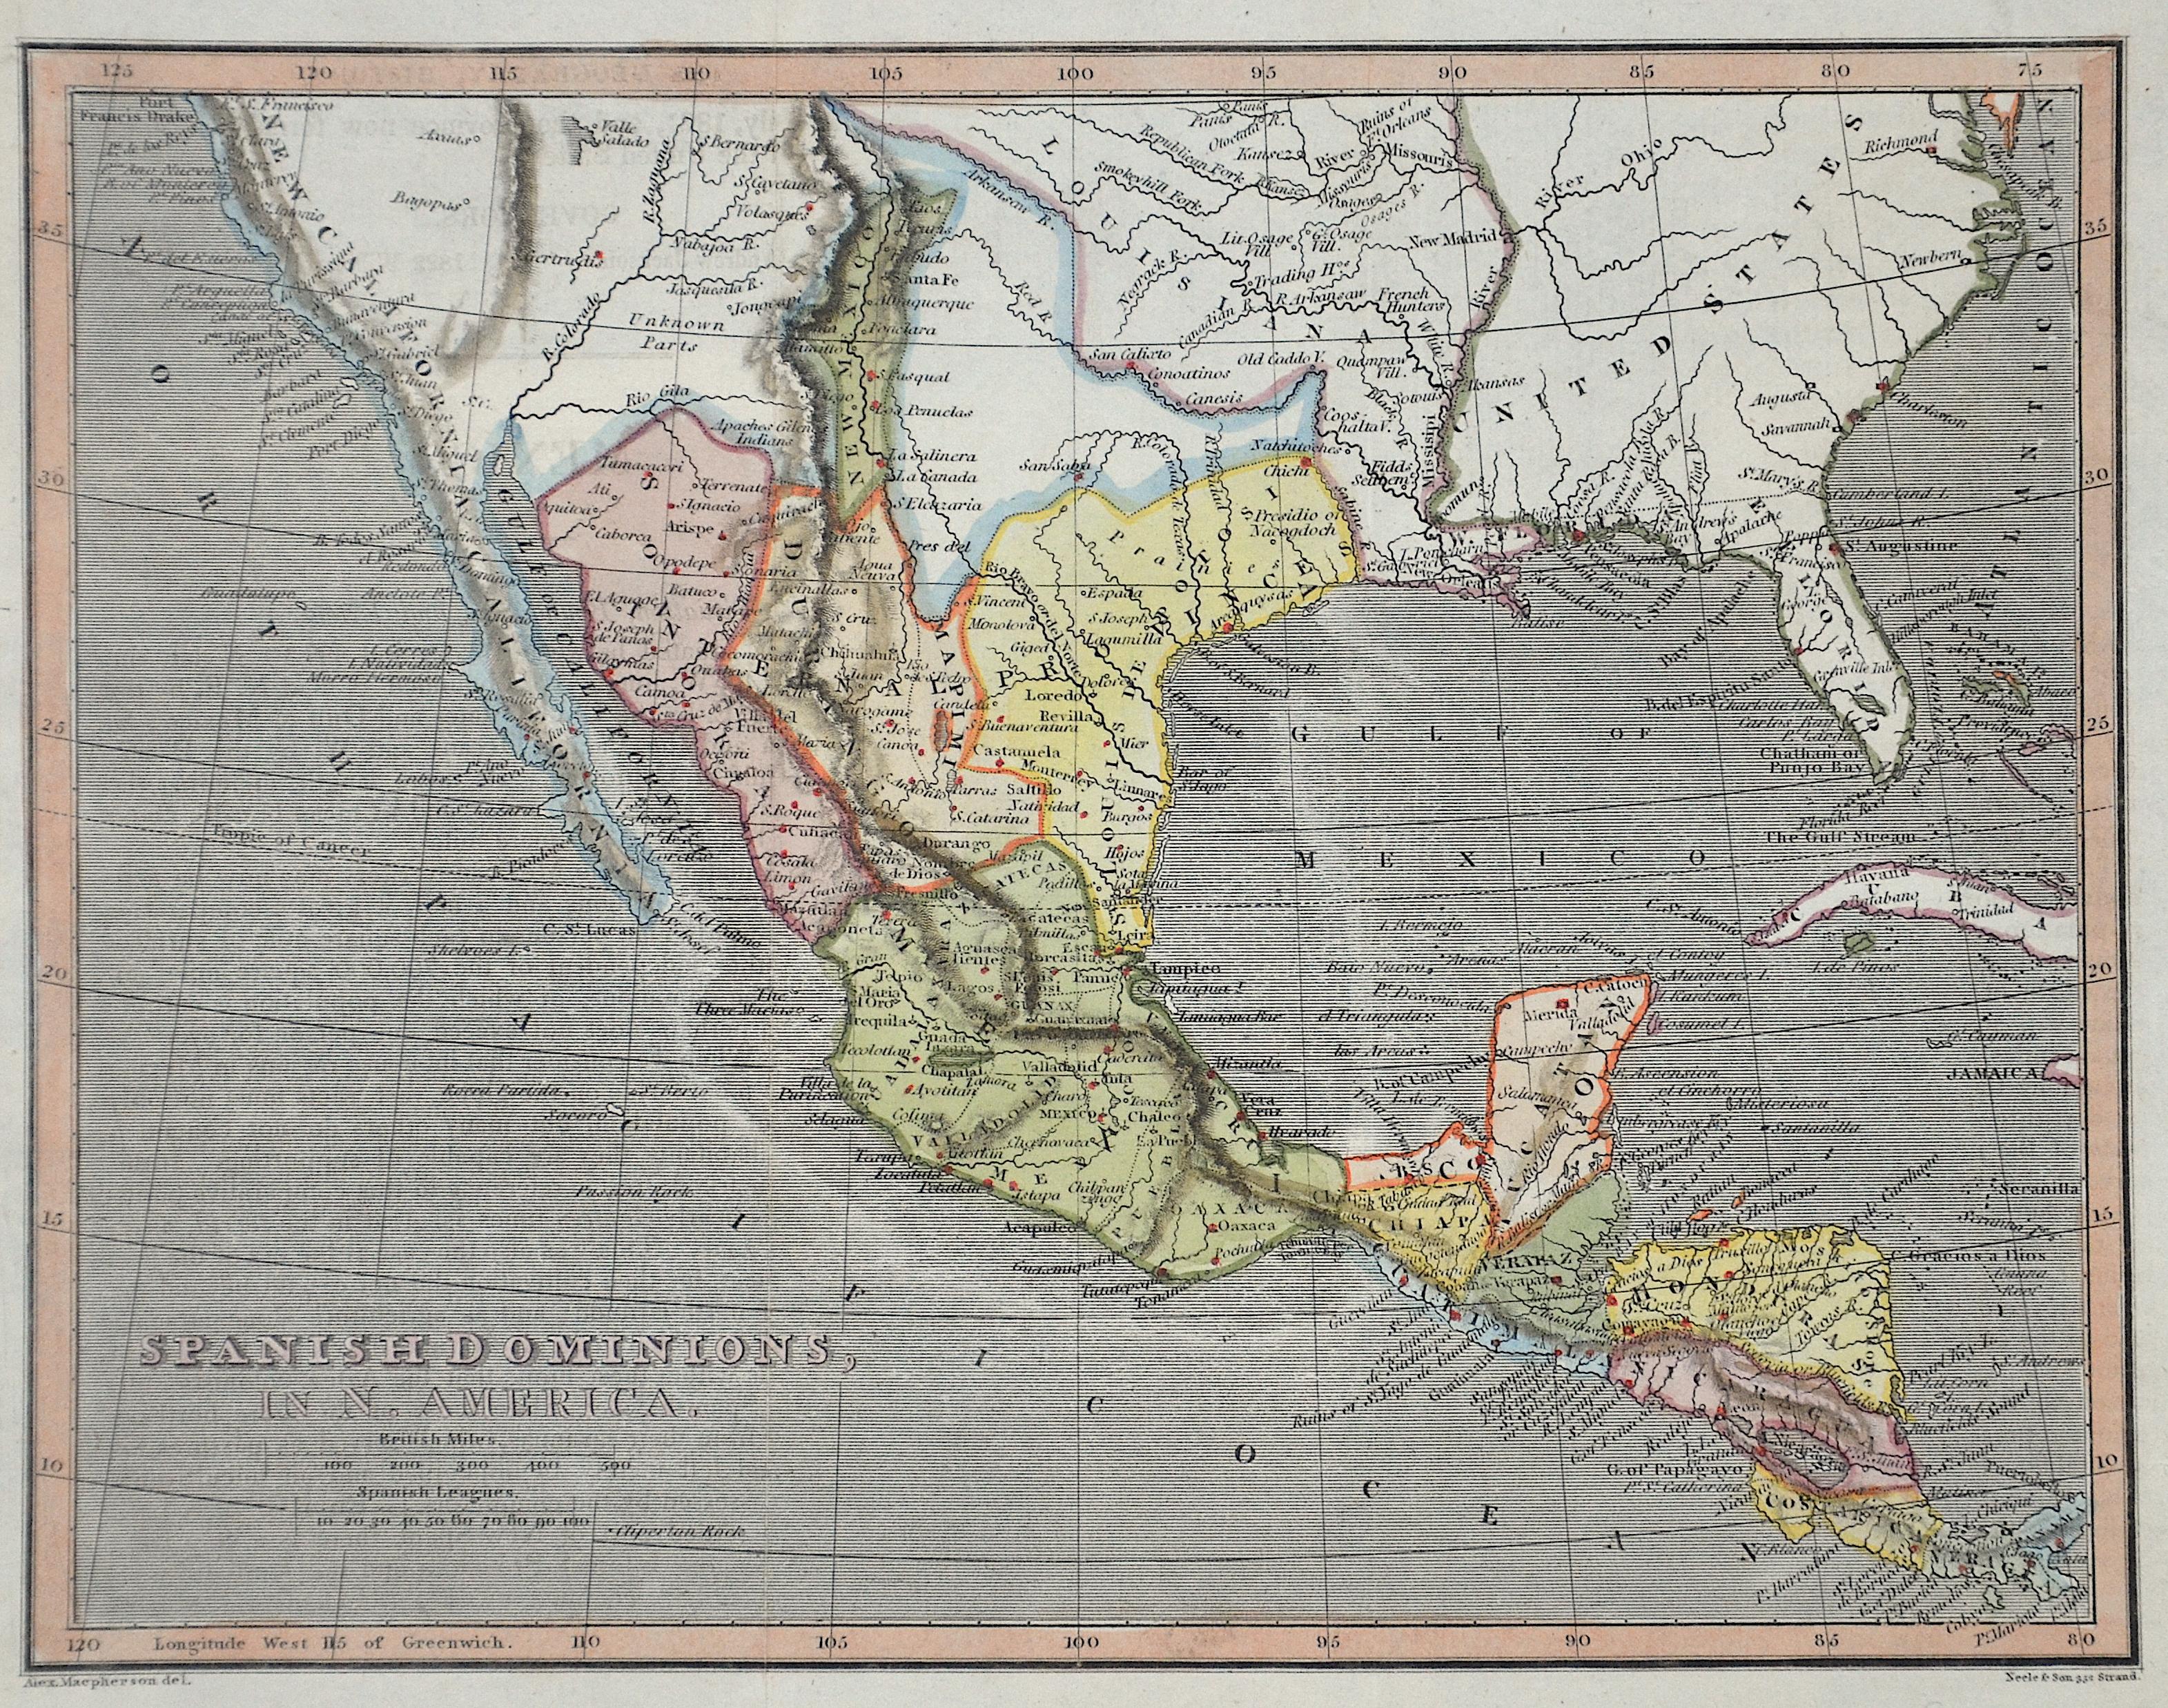 Maepherson  Spanish Dominions, in N. America